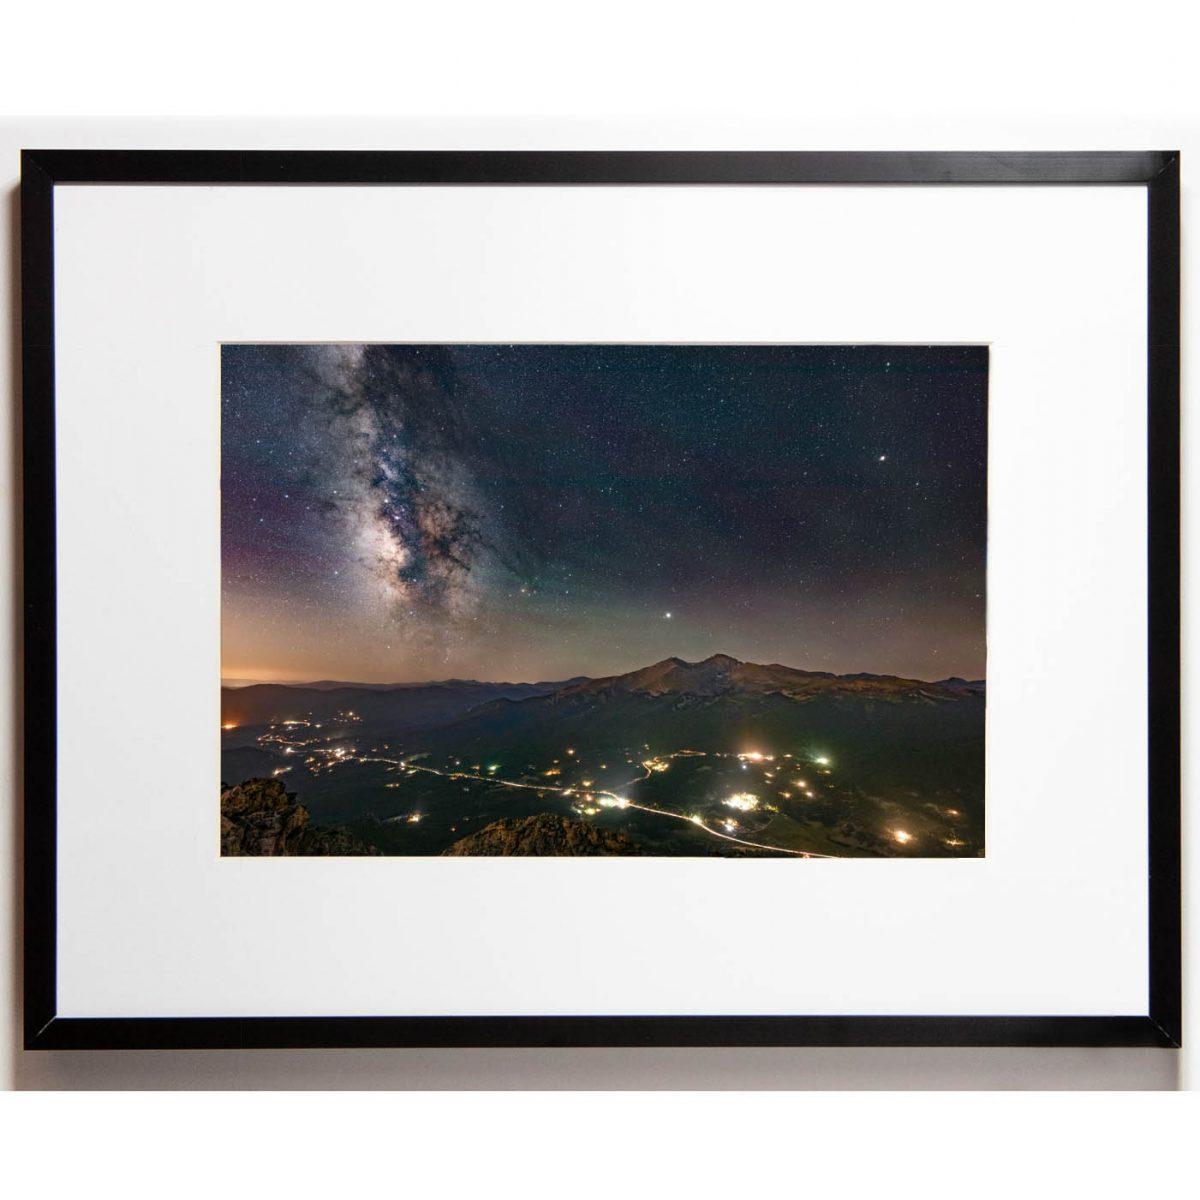 Cullis 8x12 framed - Longs Milky Way cropped